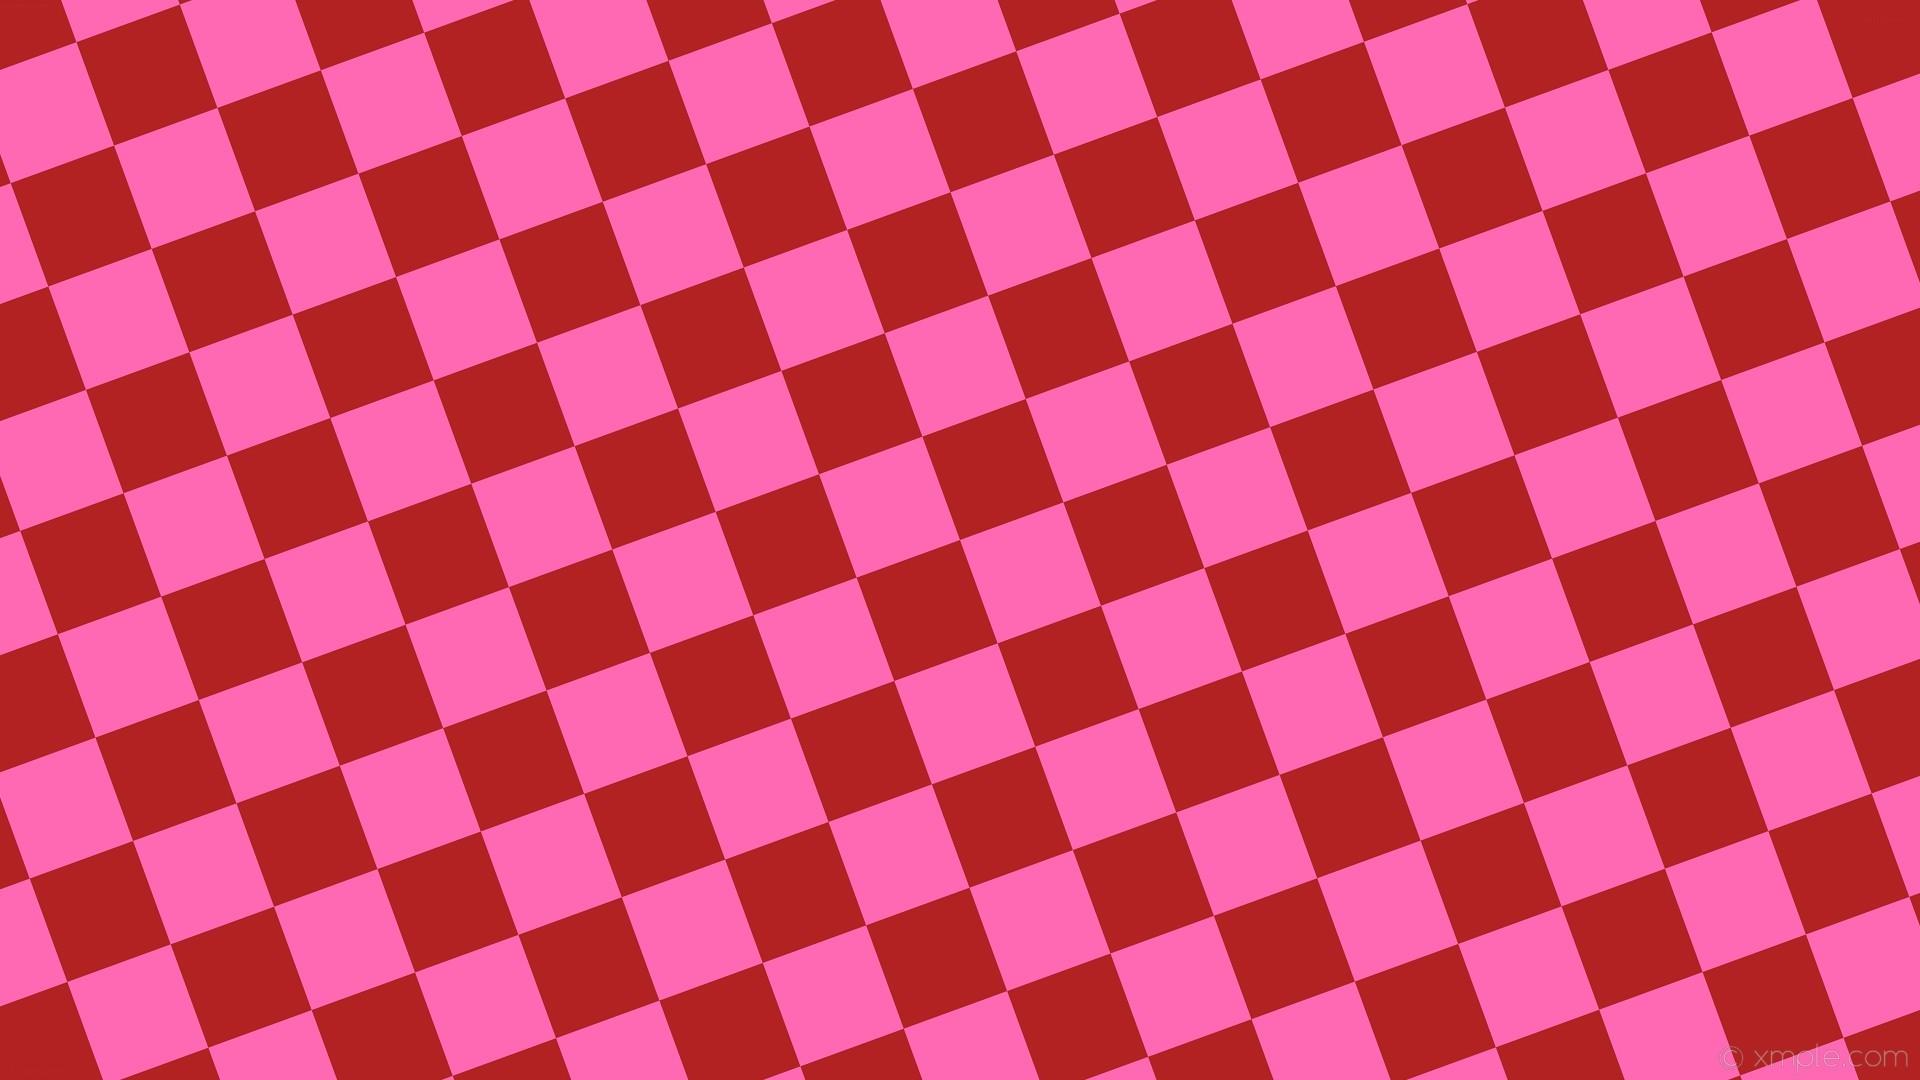 Checkerboard computer wallpaper